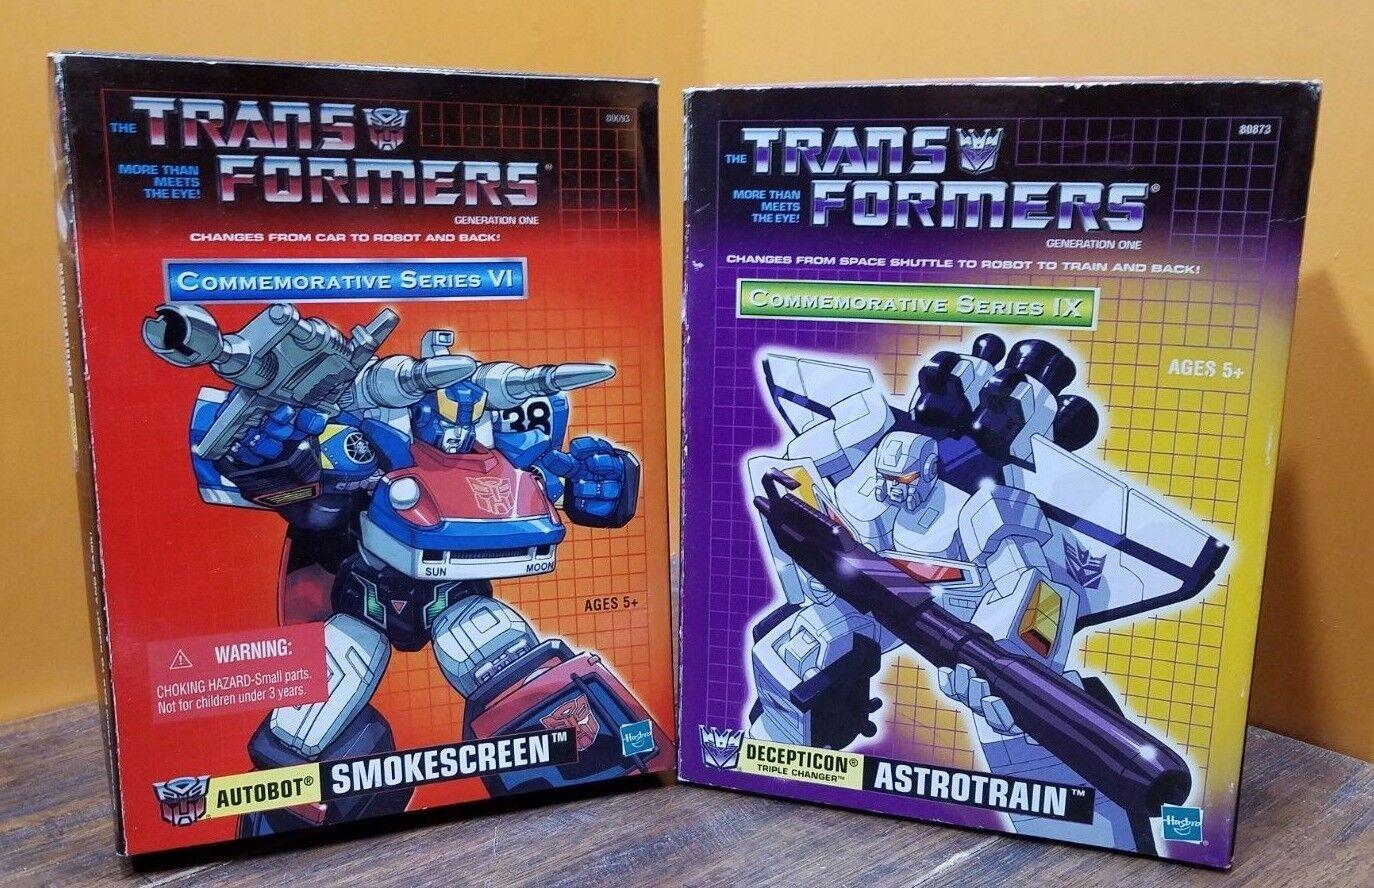 Transformadores Autobot Decepticon Astrotrain cortina de humo la serie conmemorativa Juguete